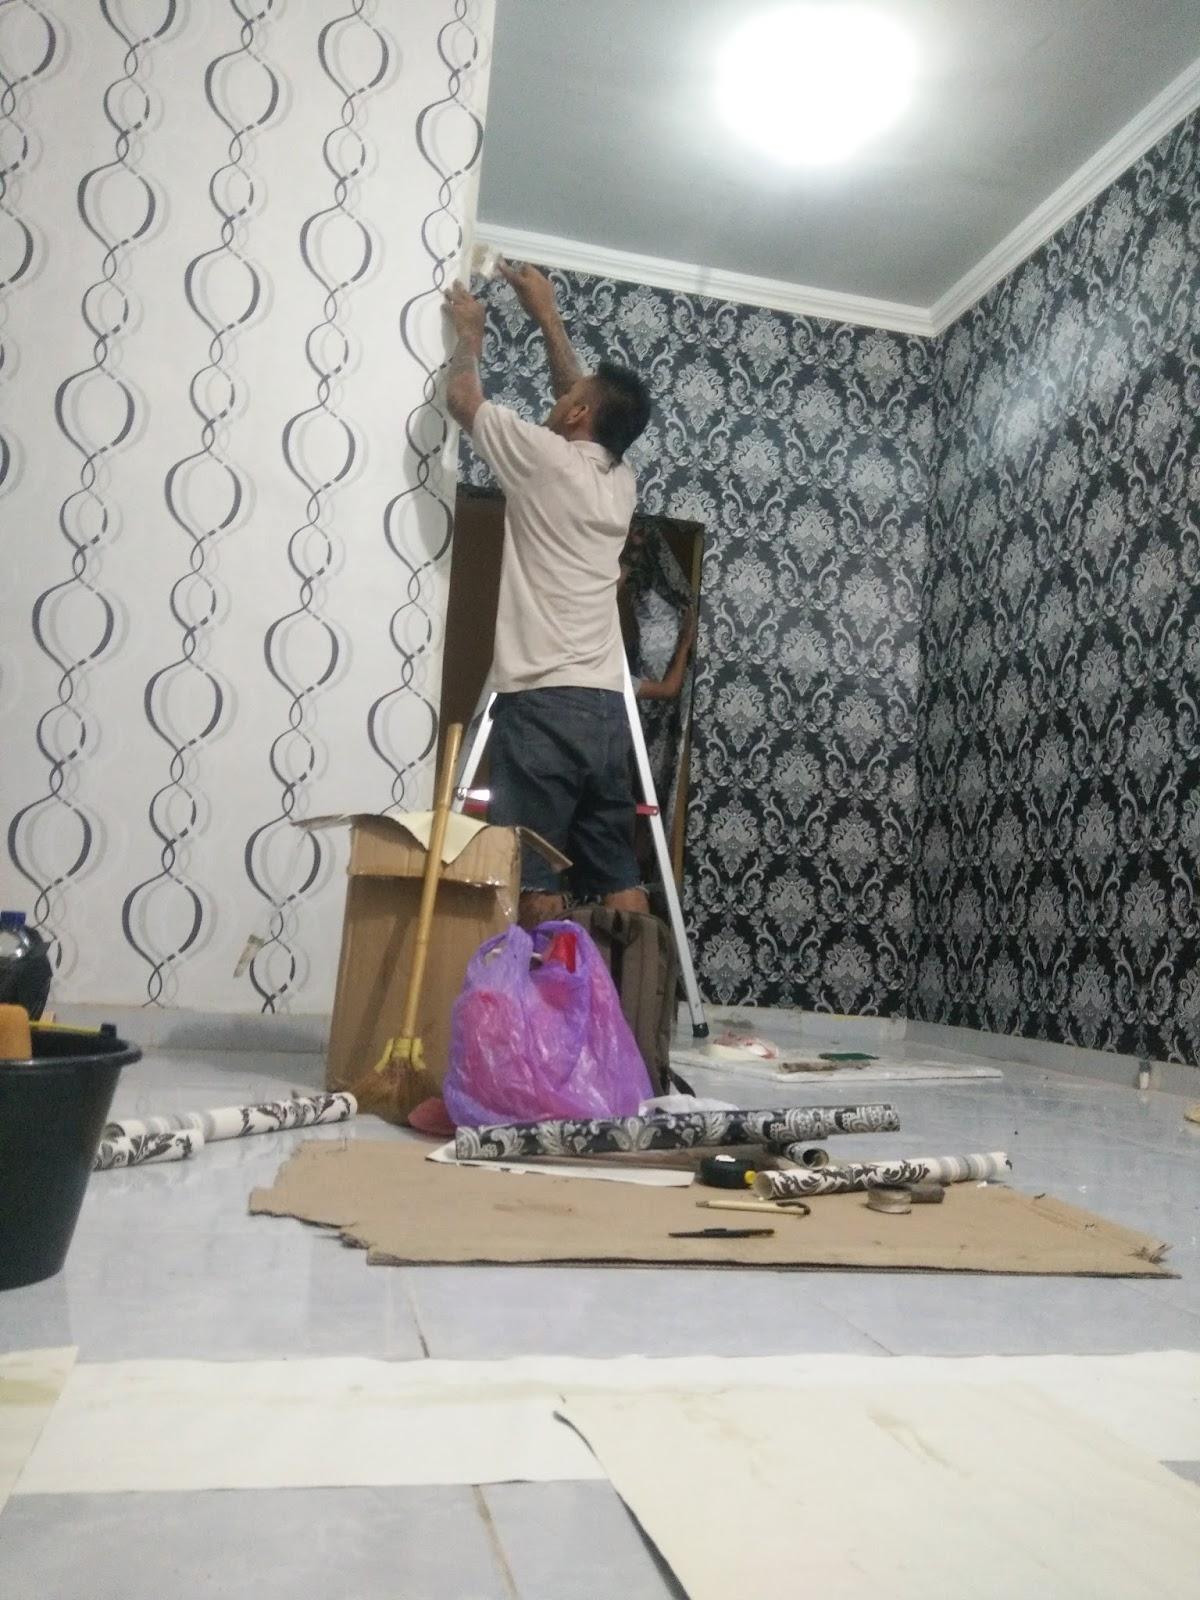 Unduh 900 Wallpaper Dinding Jogja Murah HD Terbaik